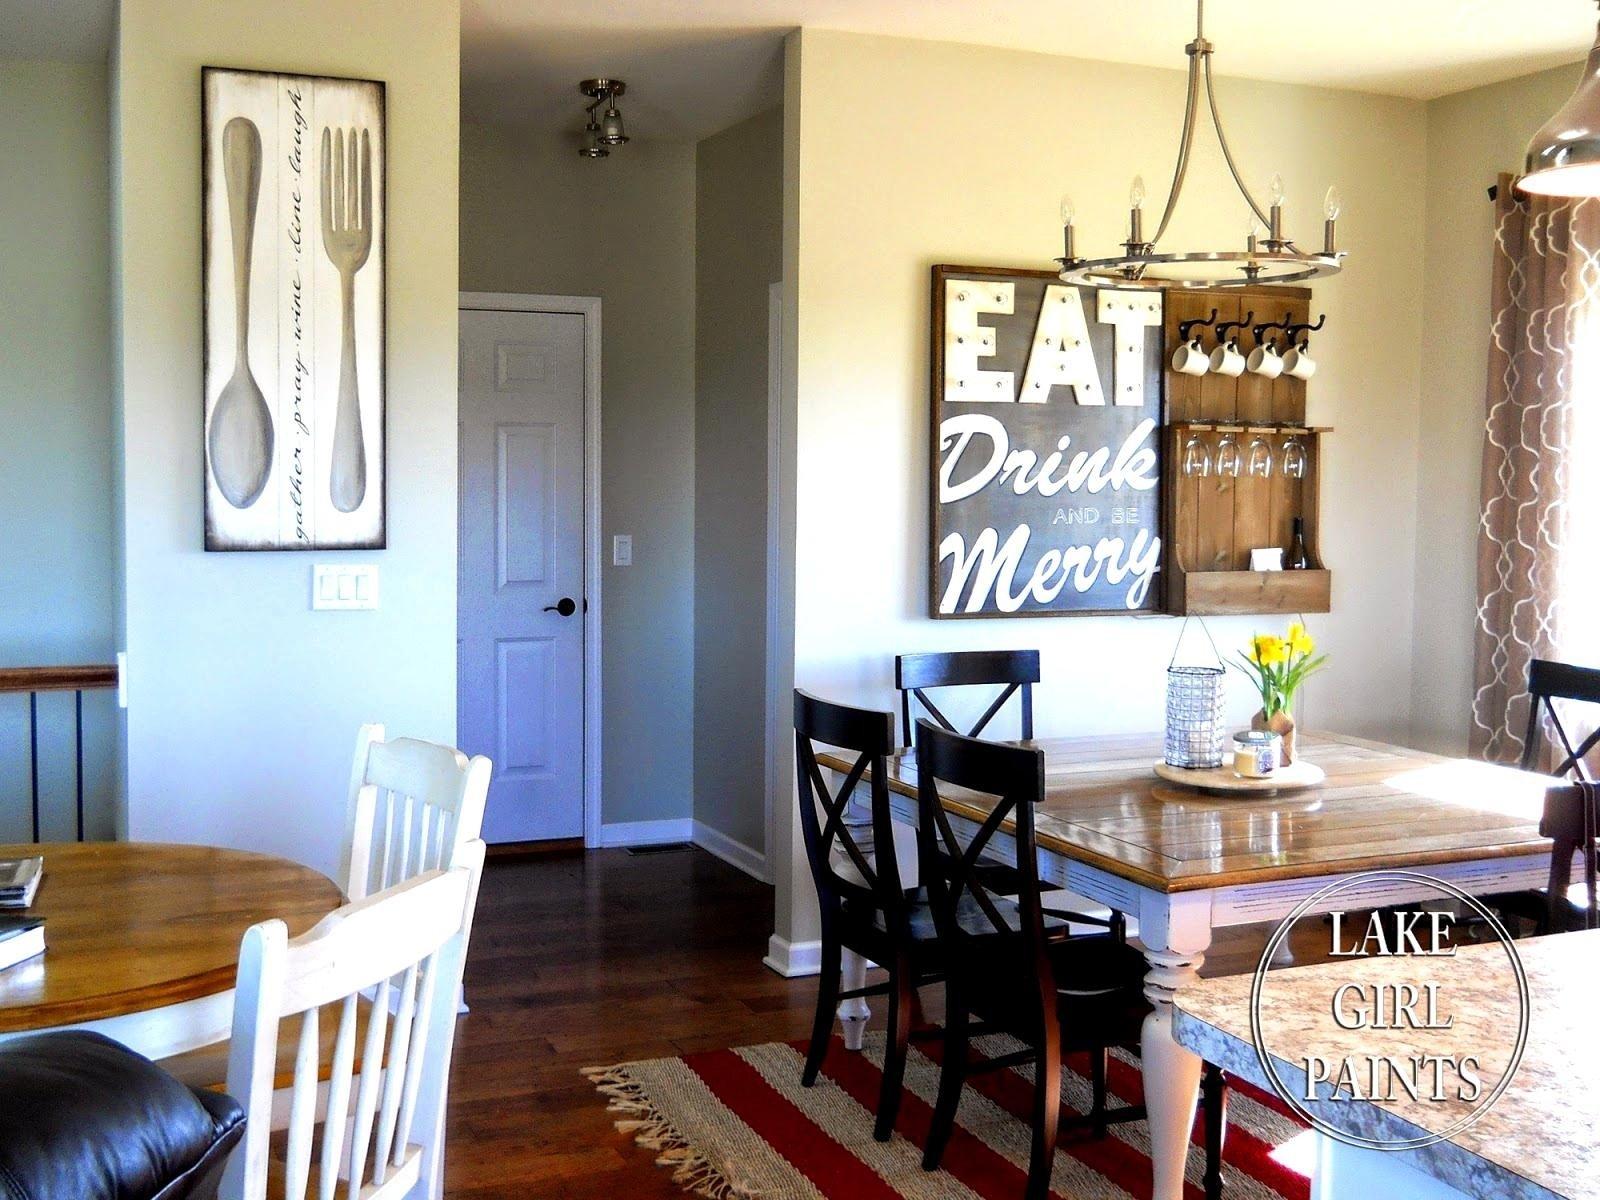 10 Stylish Dining Room Wall Art Ideas interior dining room wall art ideas powder living modern decor 1 2020